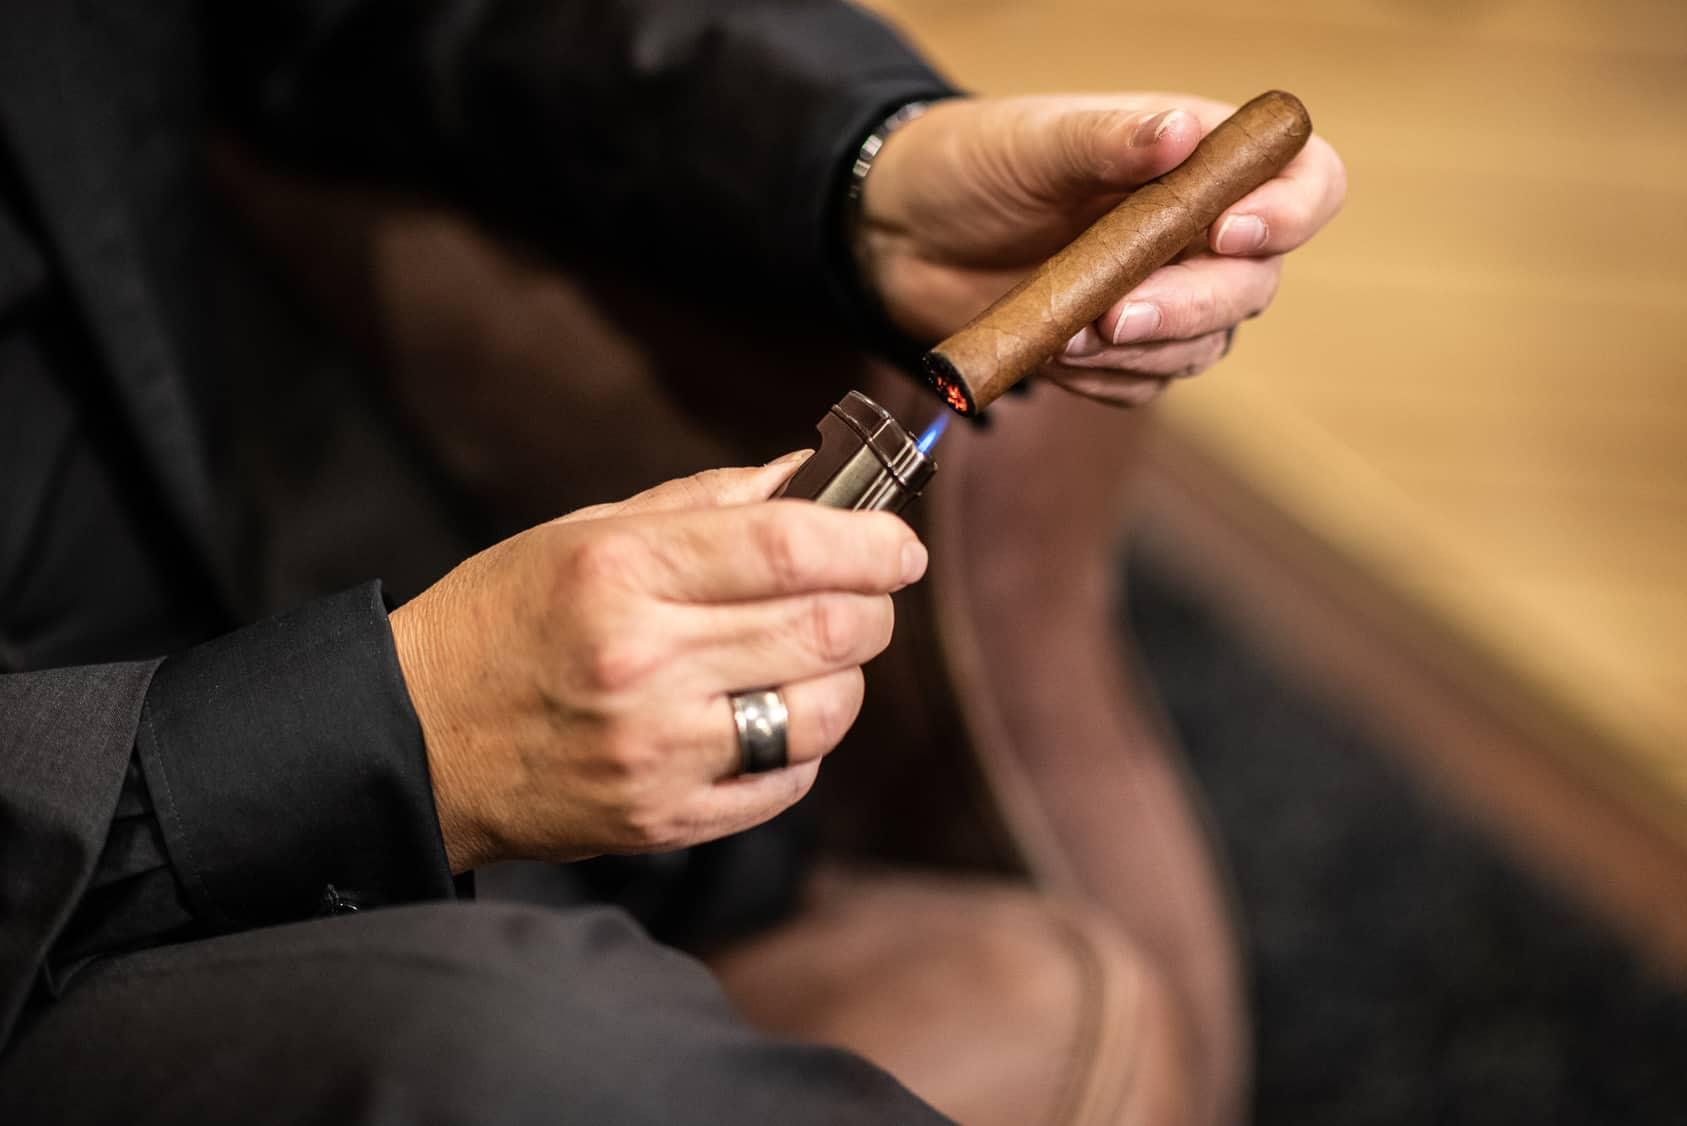 Man in suit lighting a cigar